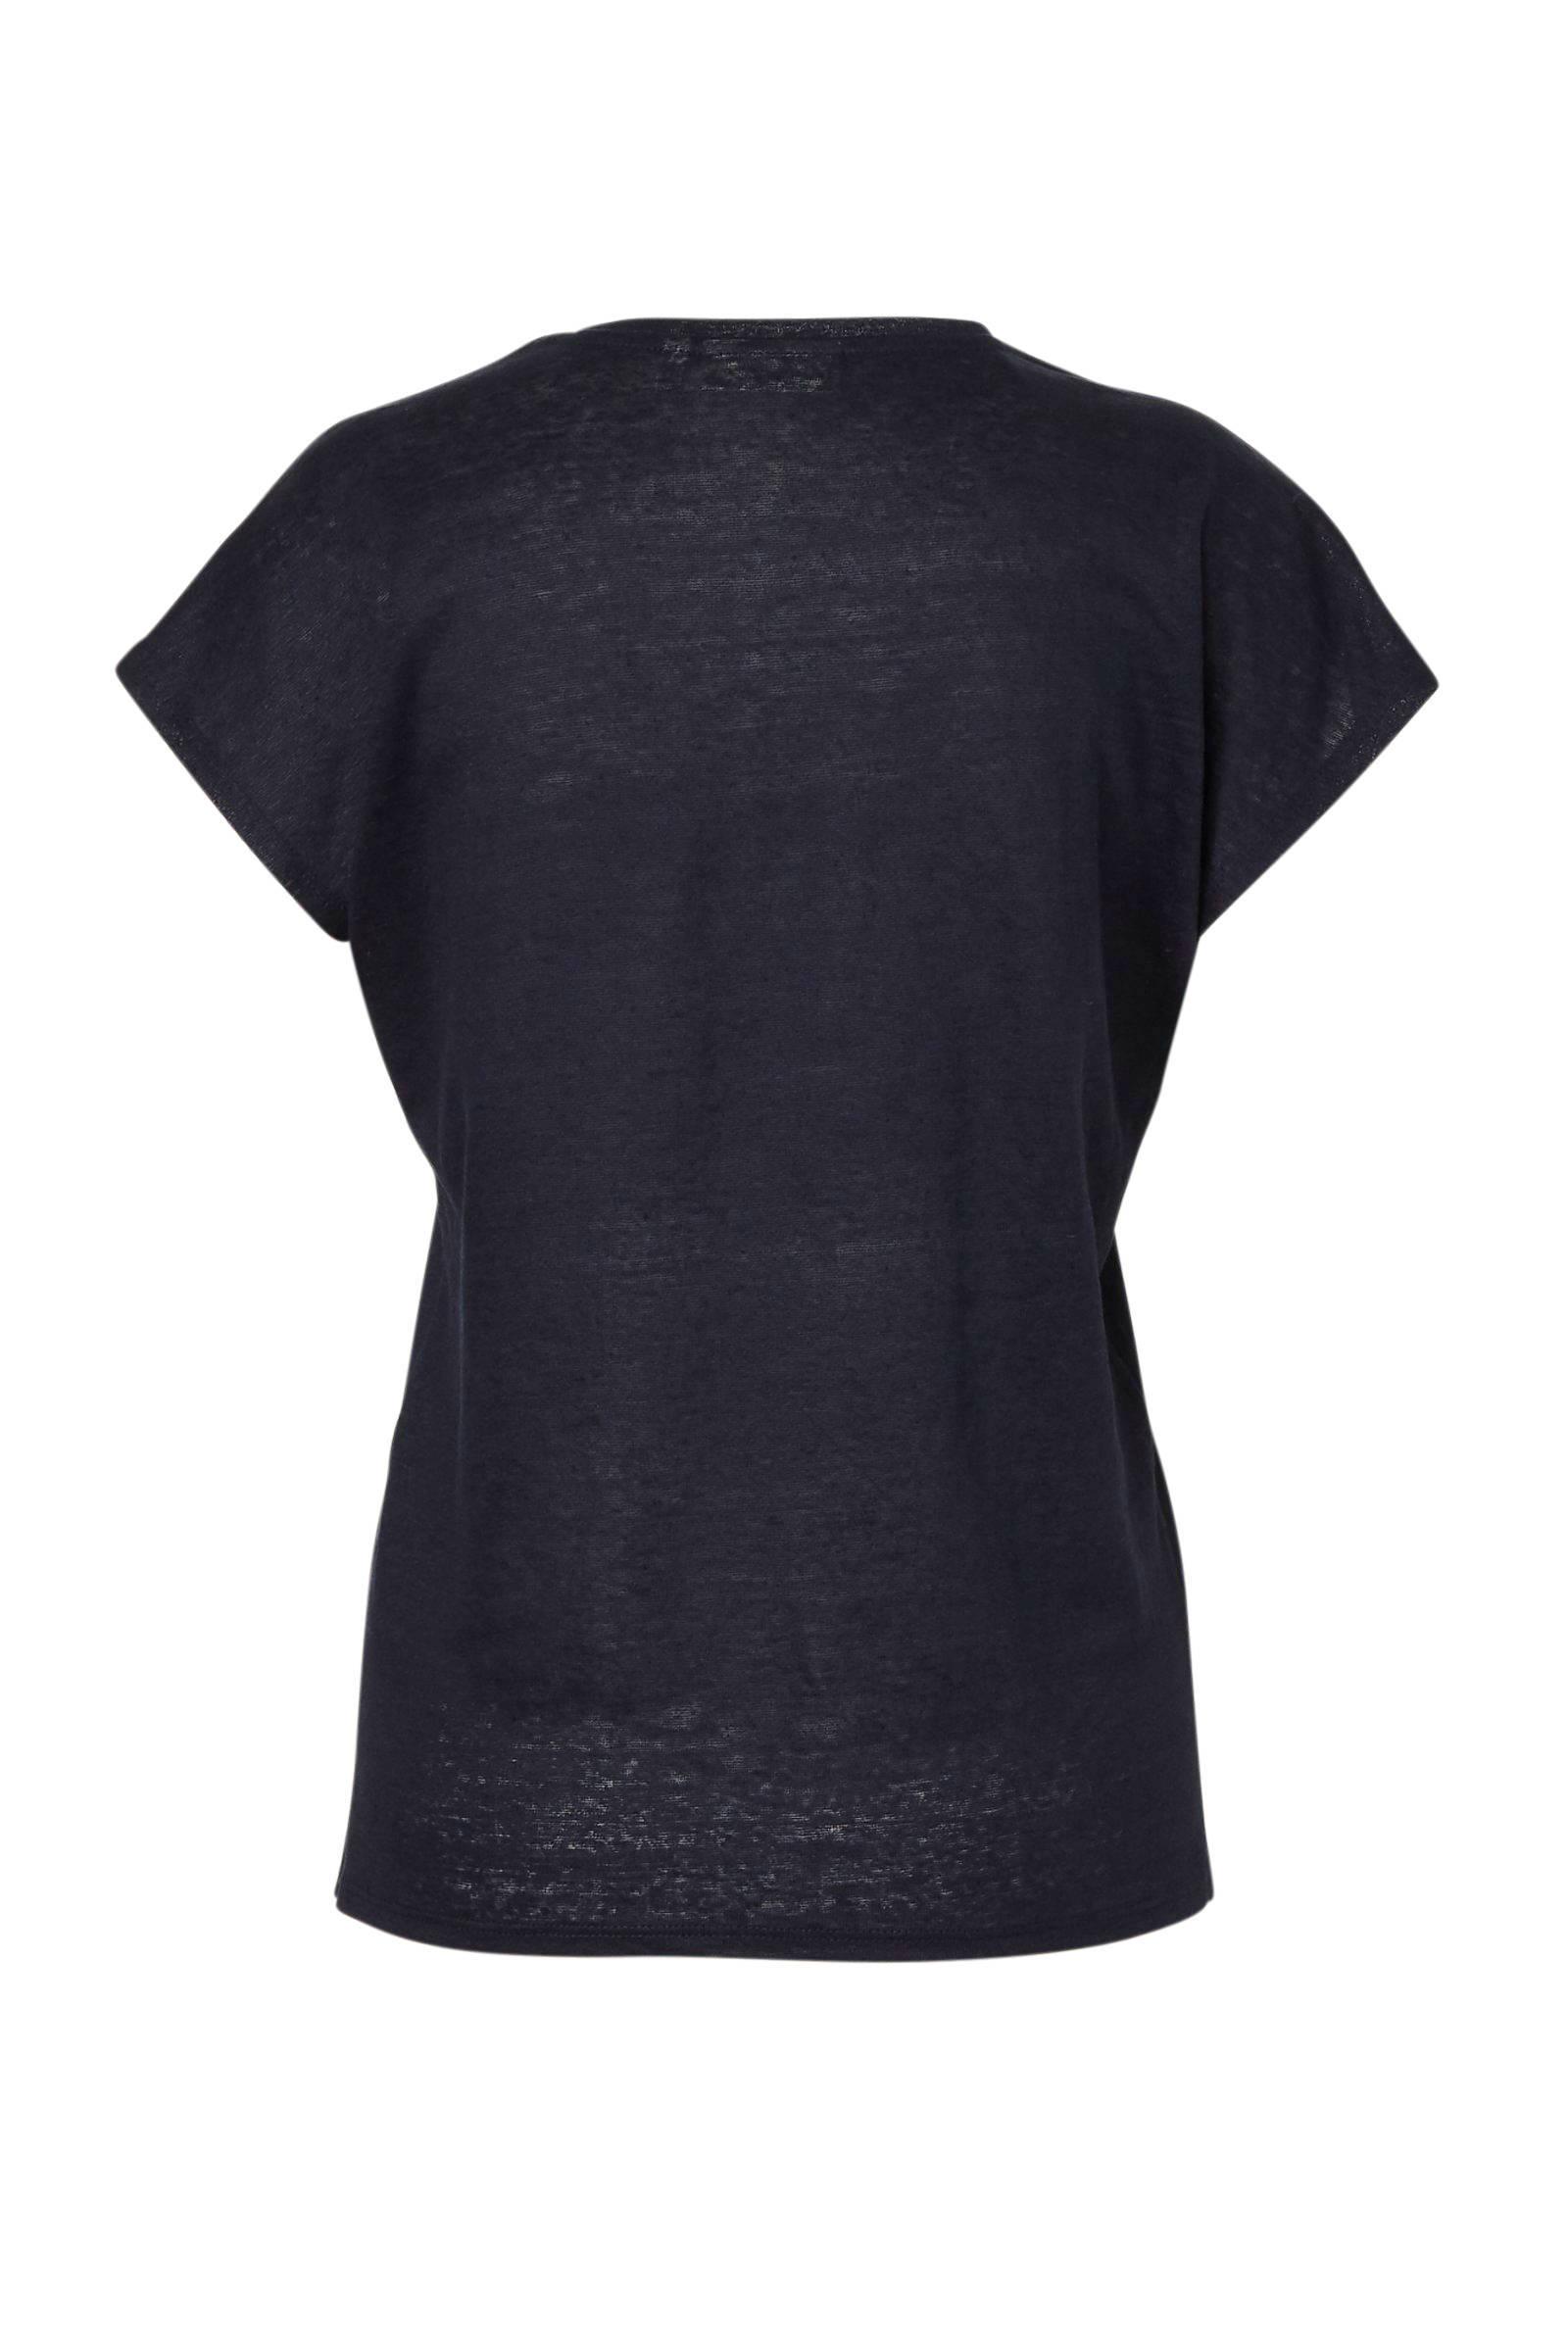 Inwear T-shirt Donkerblauw VOzp5B2o